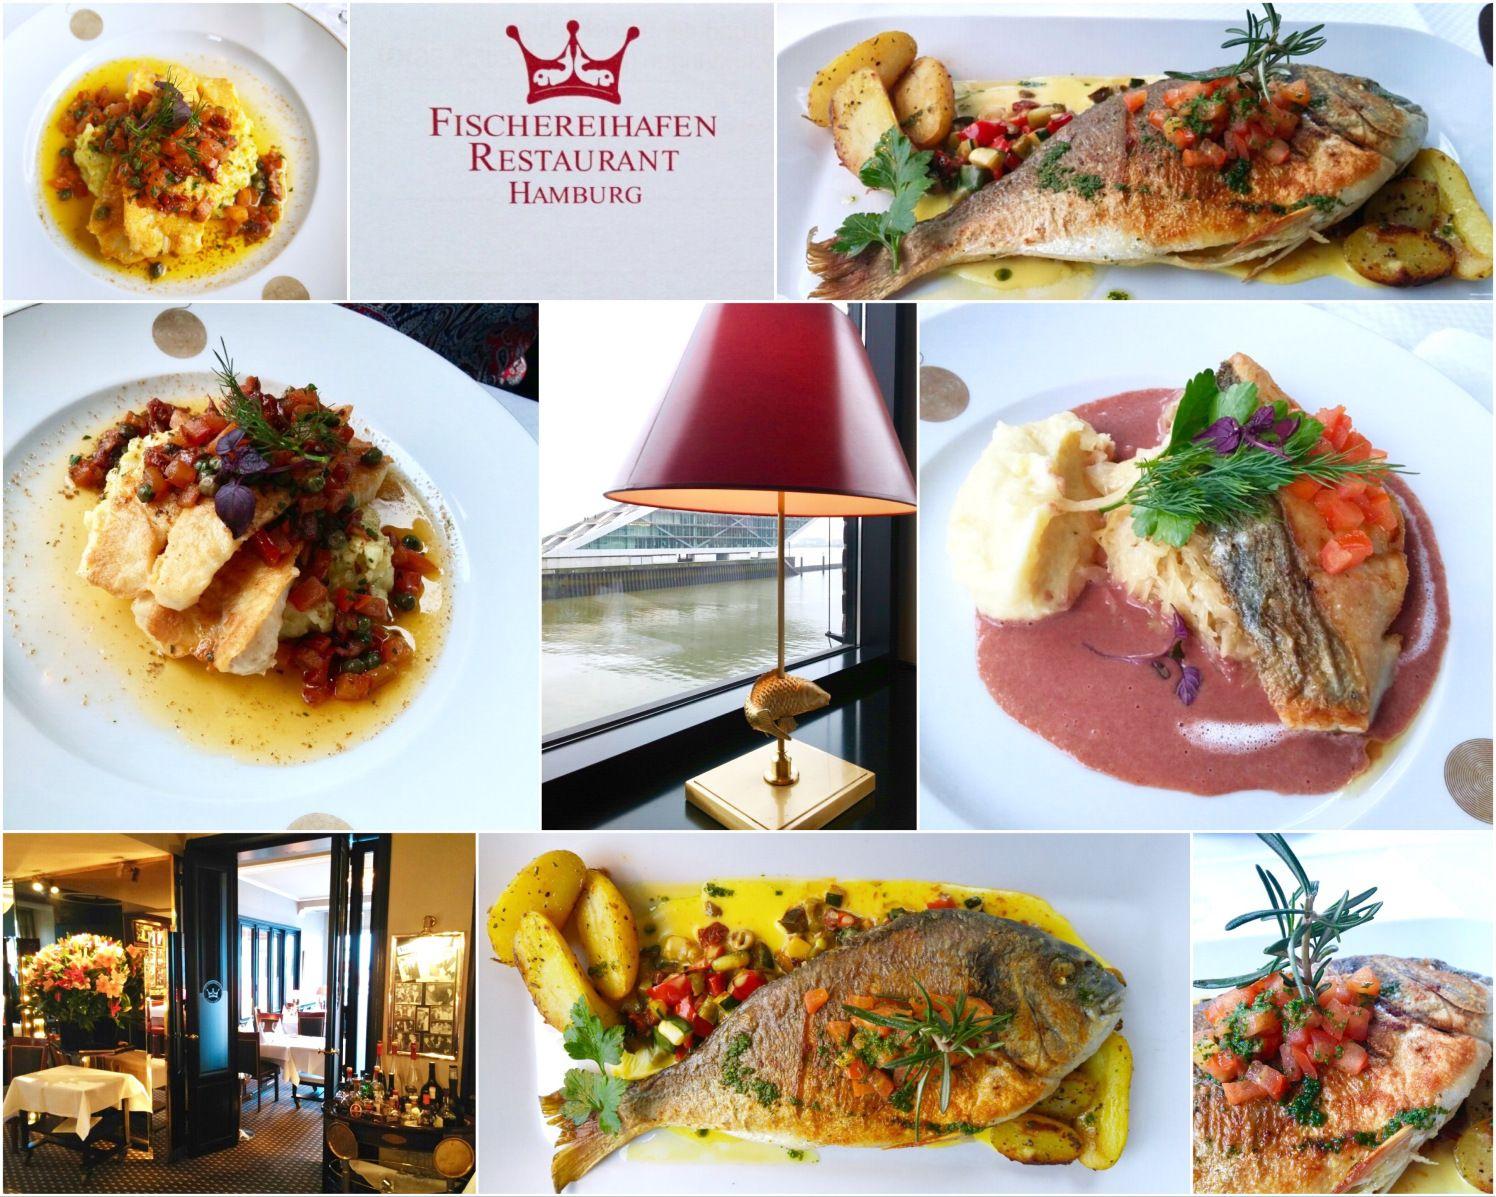 Gourmet menü restaurant hamburg fischereihafen Food